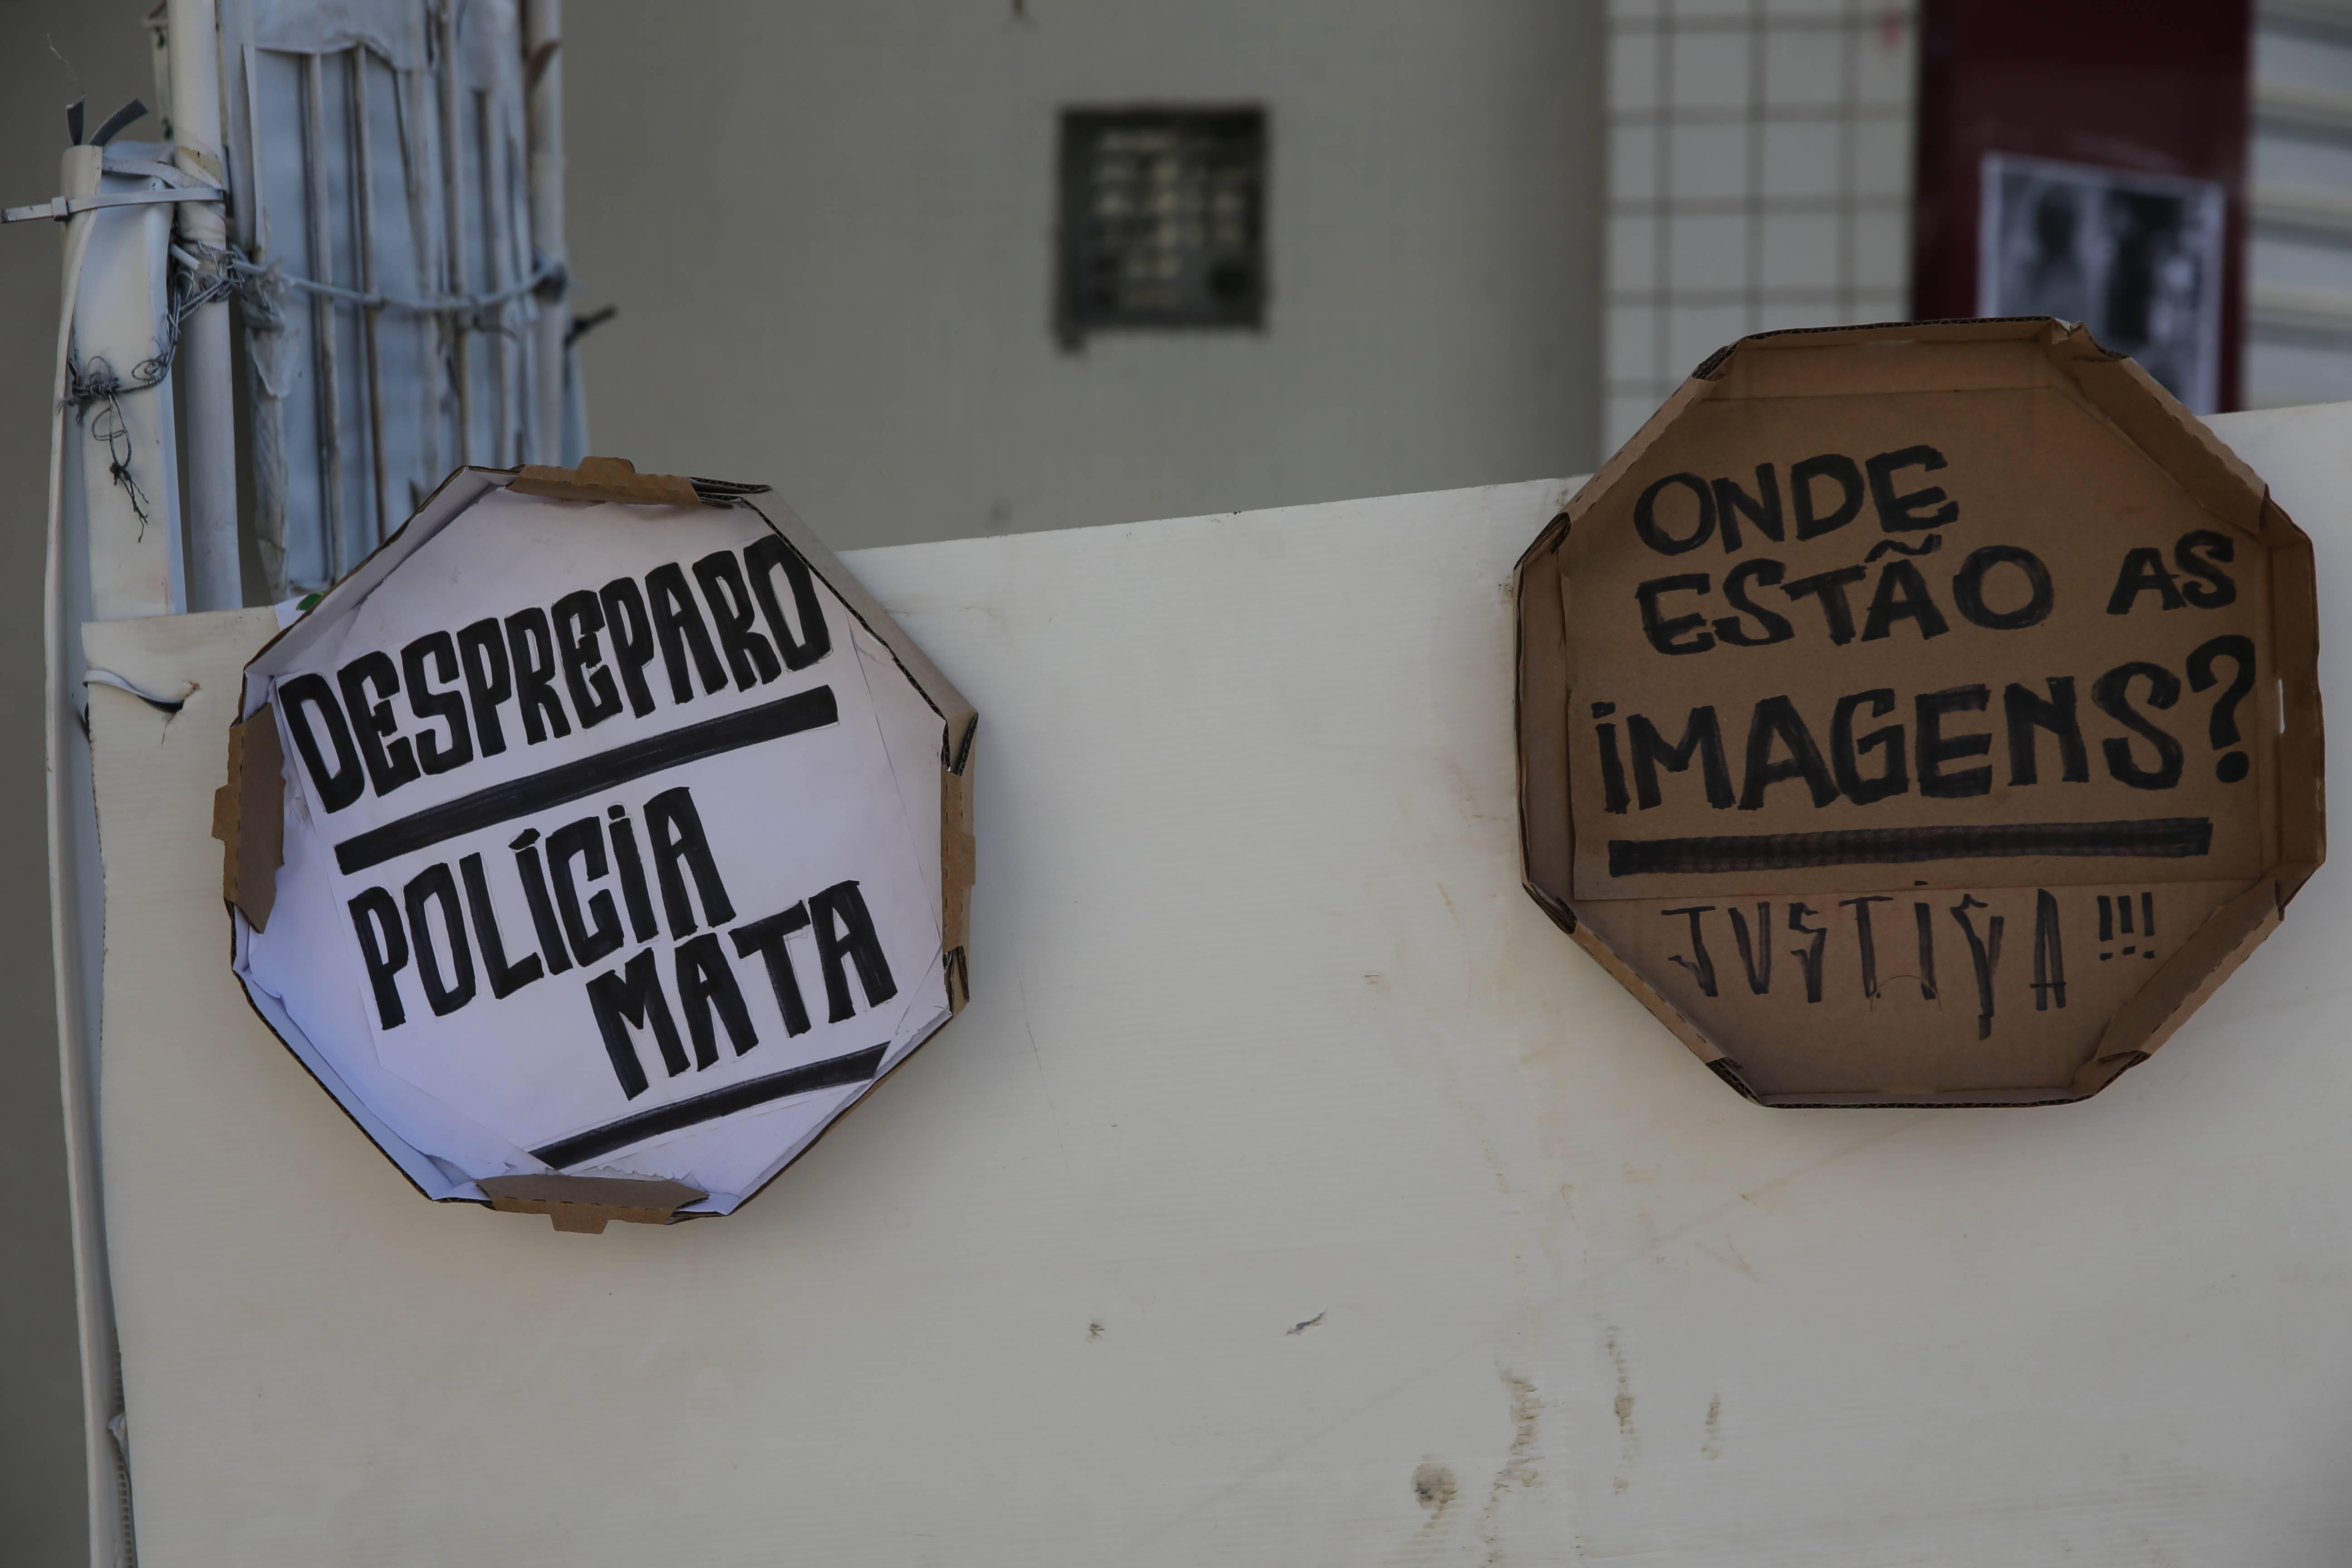 Caso levantou debate sobre despreparo da PM | André Porto André Porto / Metro Jornal